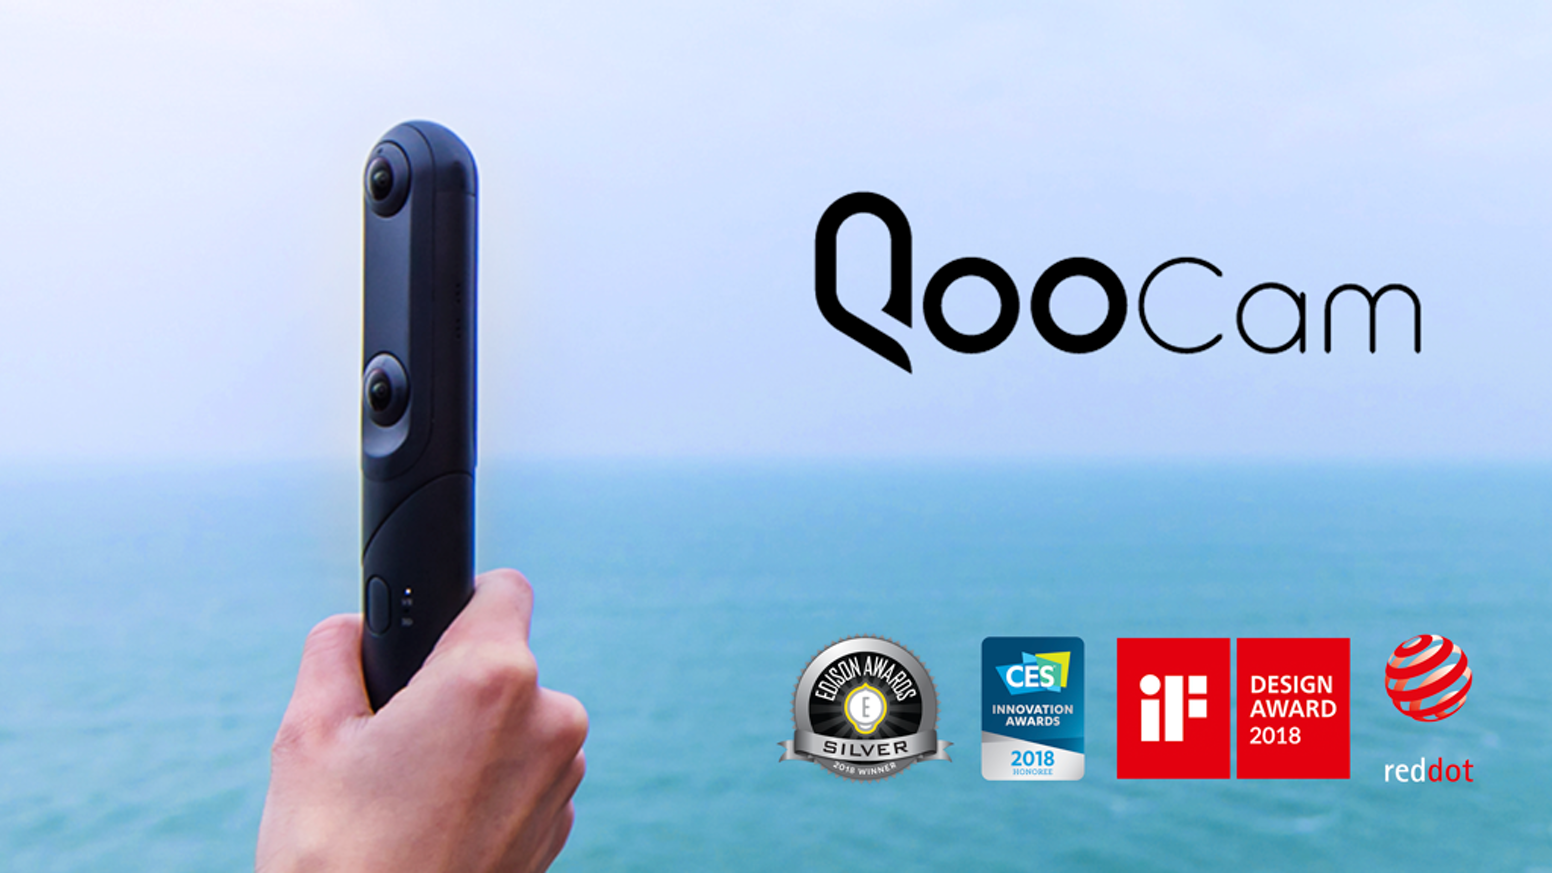 camera 360 pro apk free download